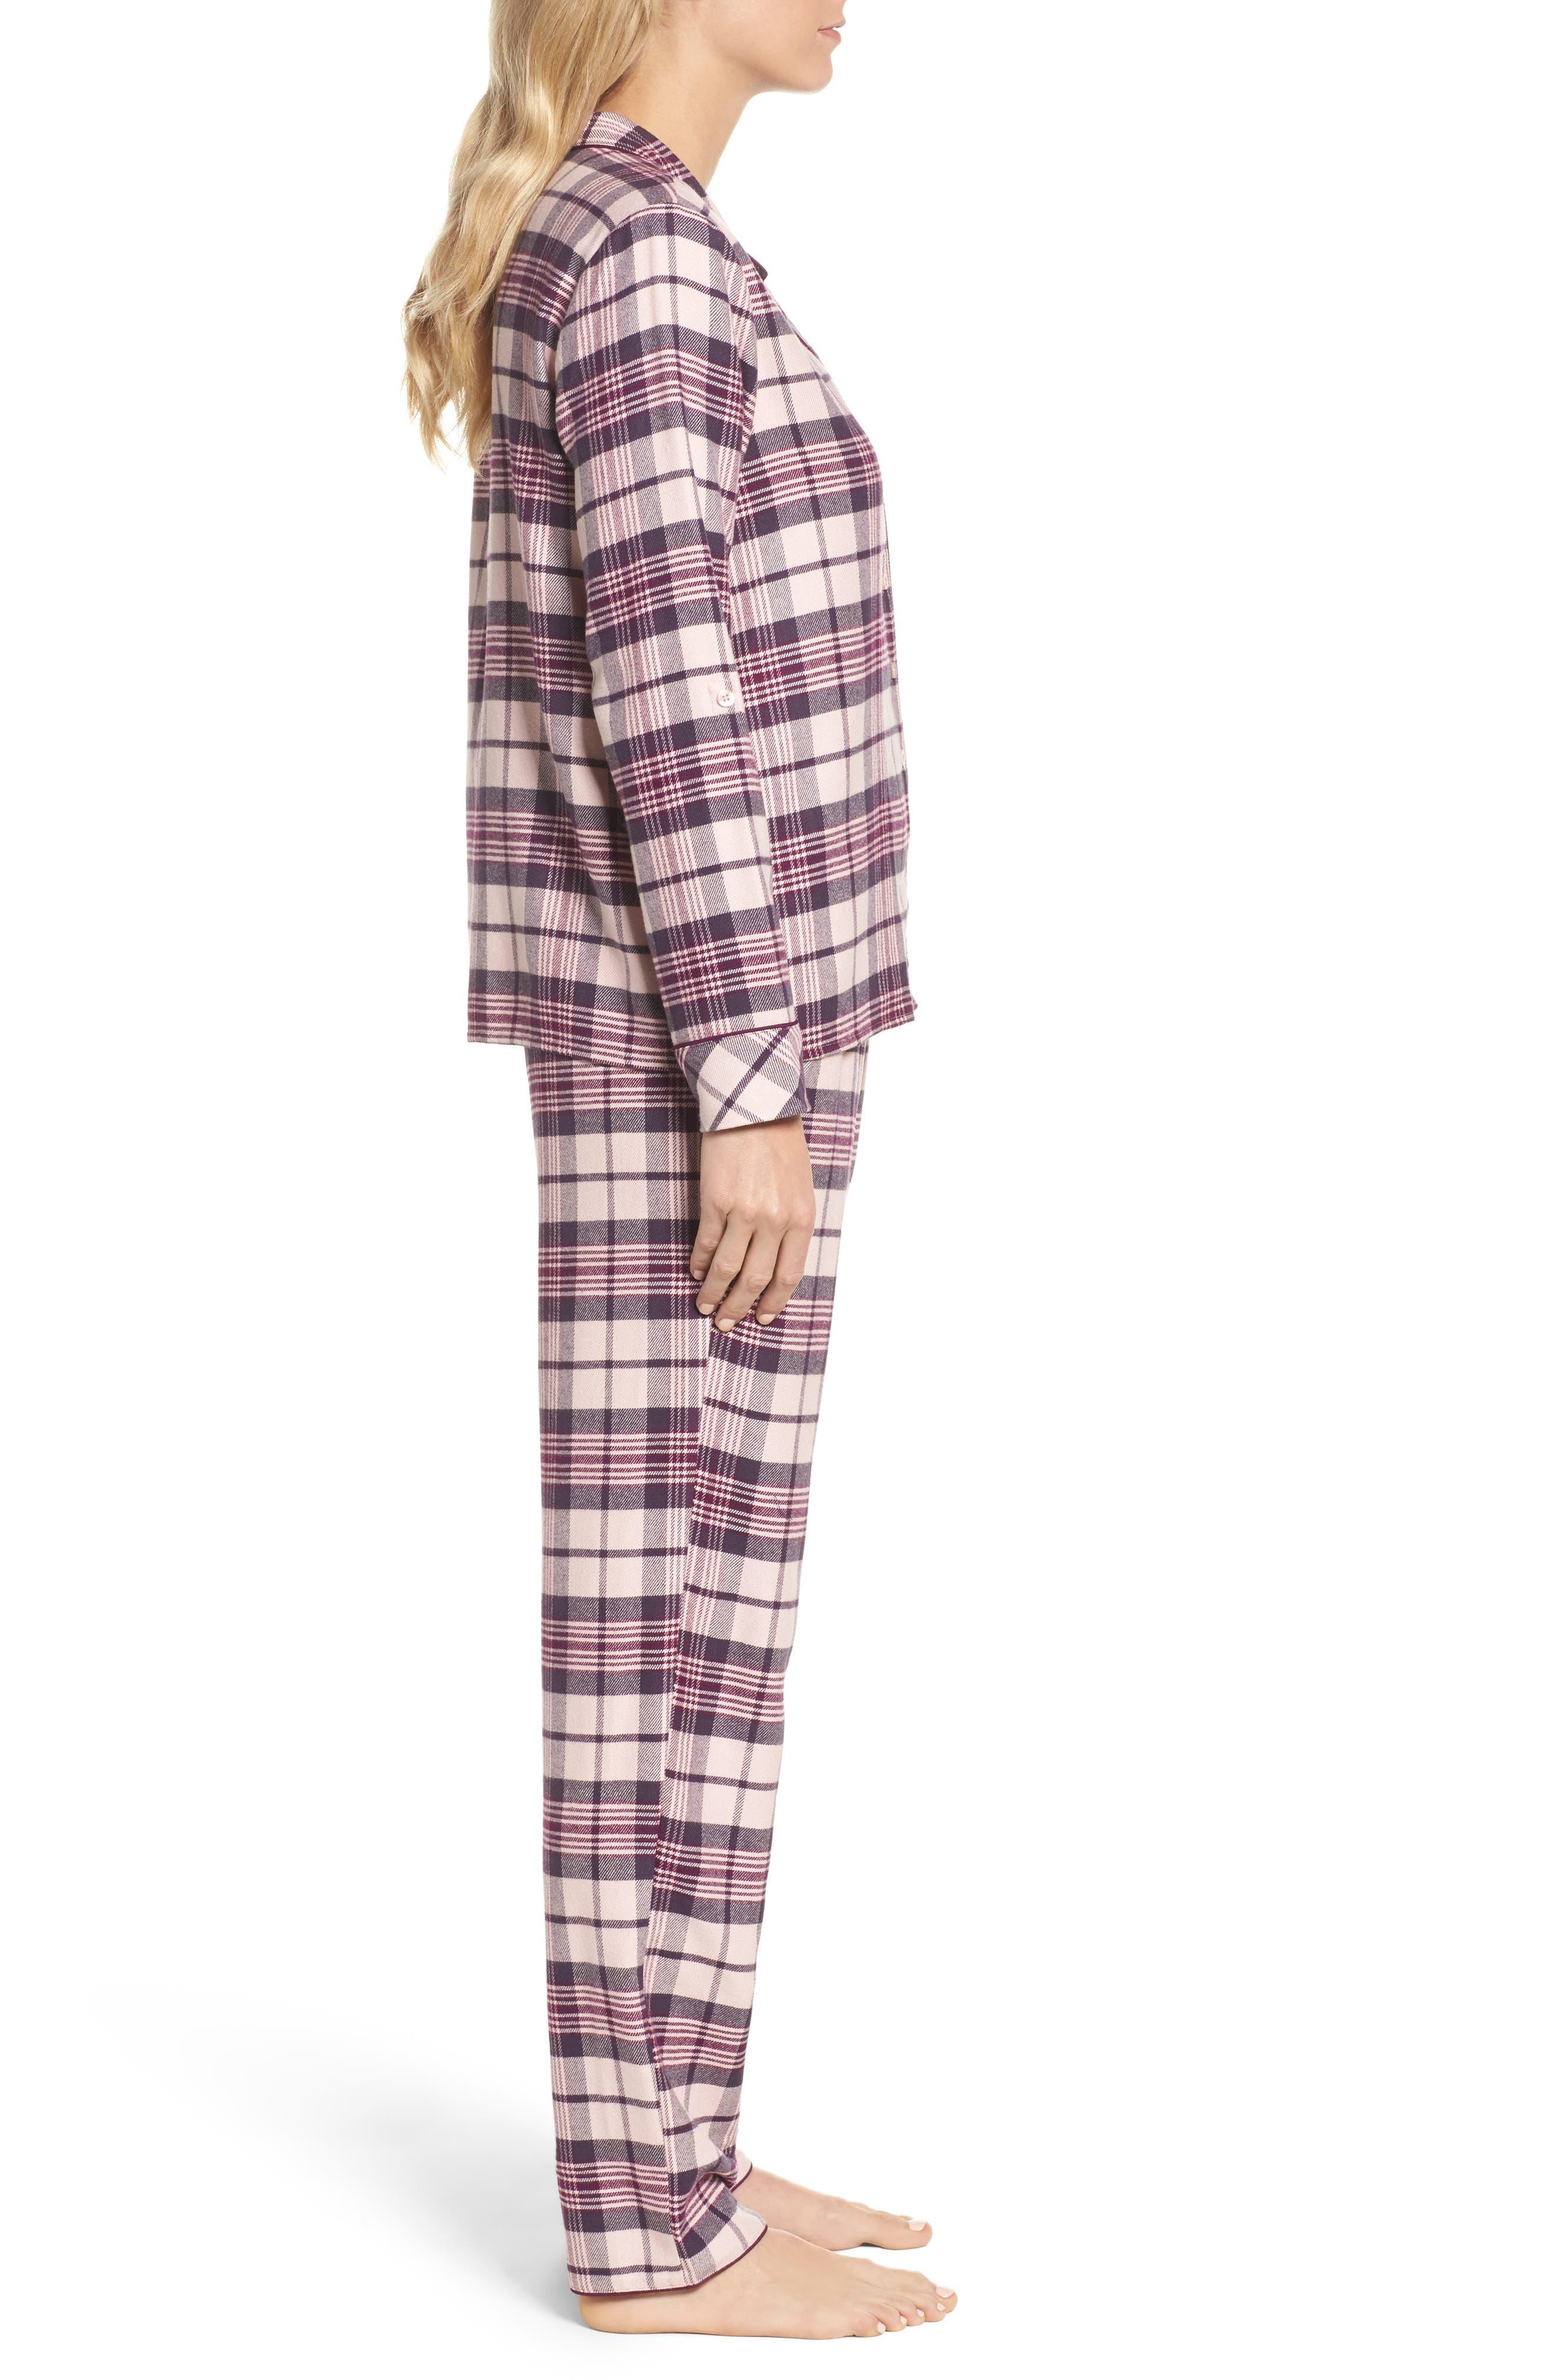 Lingerie Starlight Flannel Pajamas,                             Alternate thumbnail 3, color,                             Pink Peony Bud Tonal Tartan